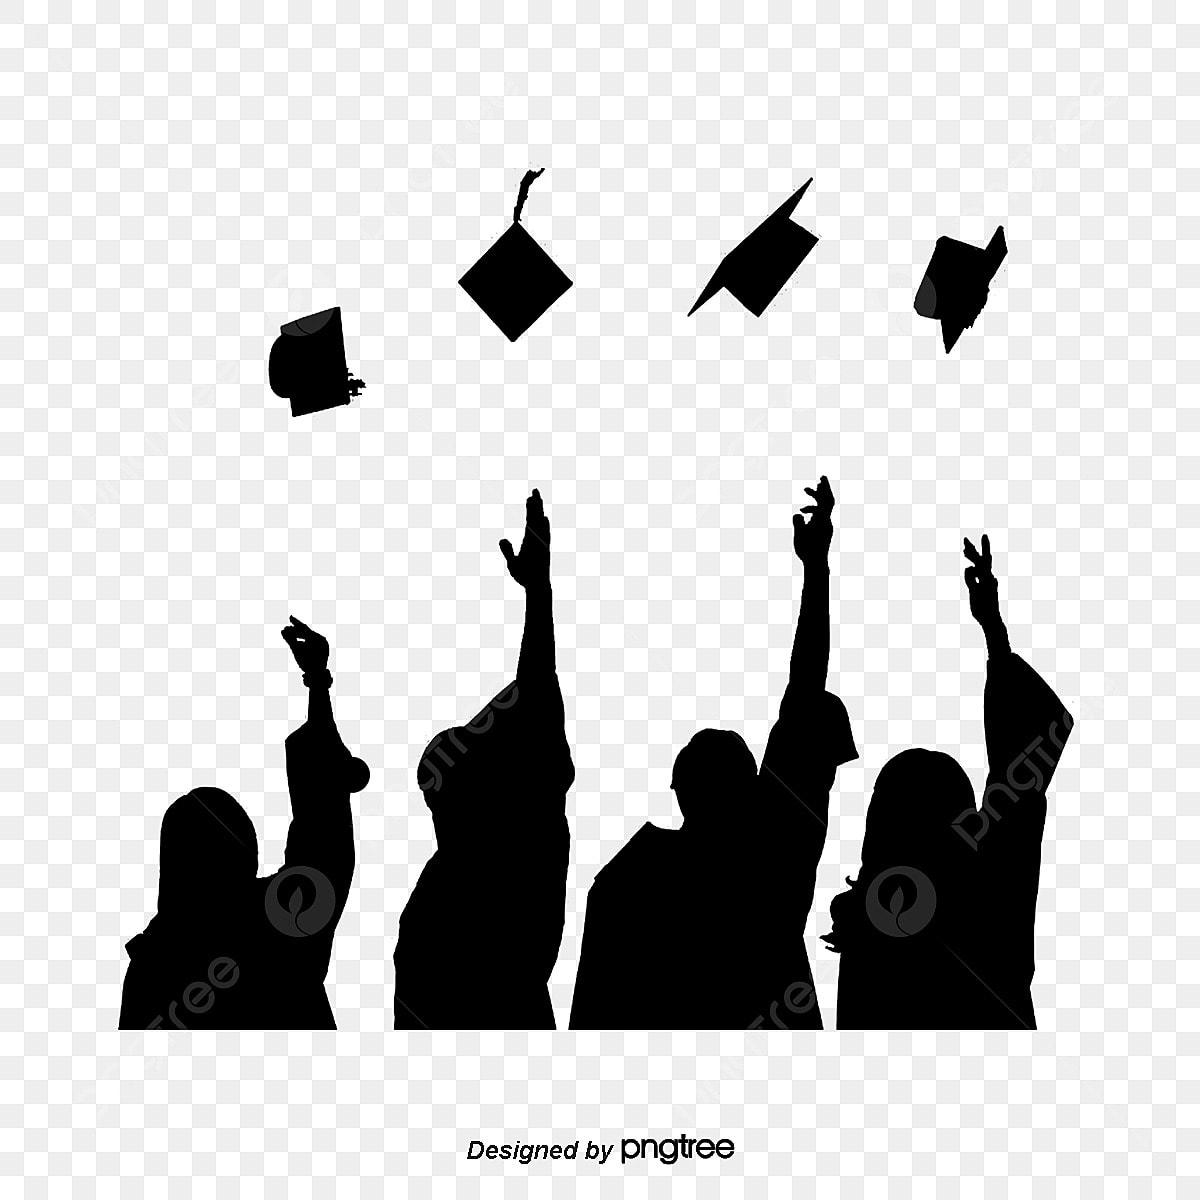 Silhouette Of Graduation Cap, Figure Silhouette, College